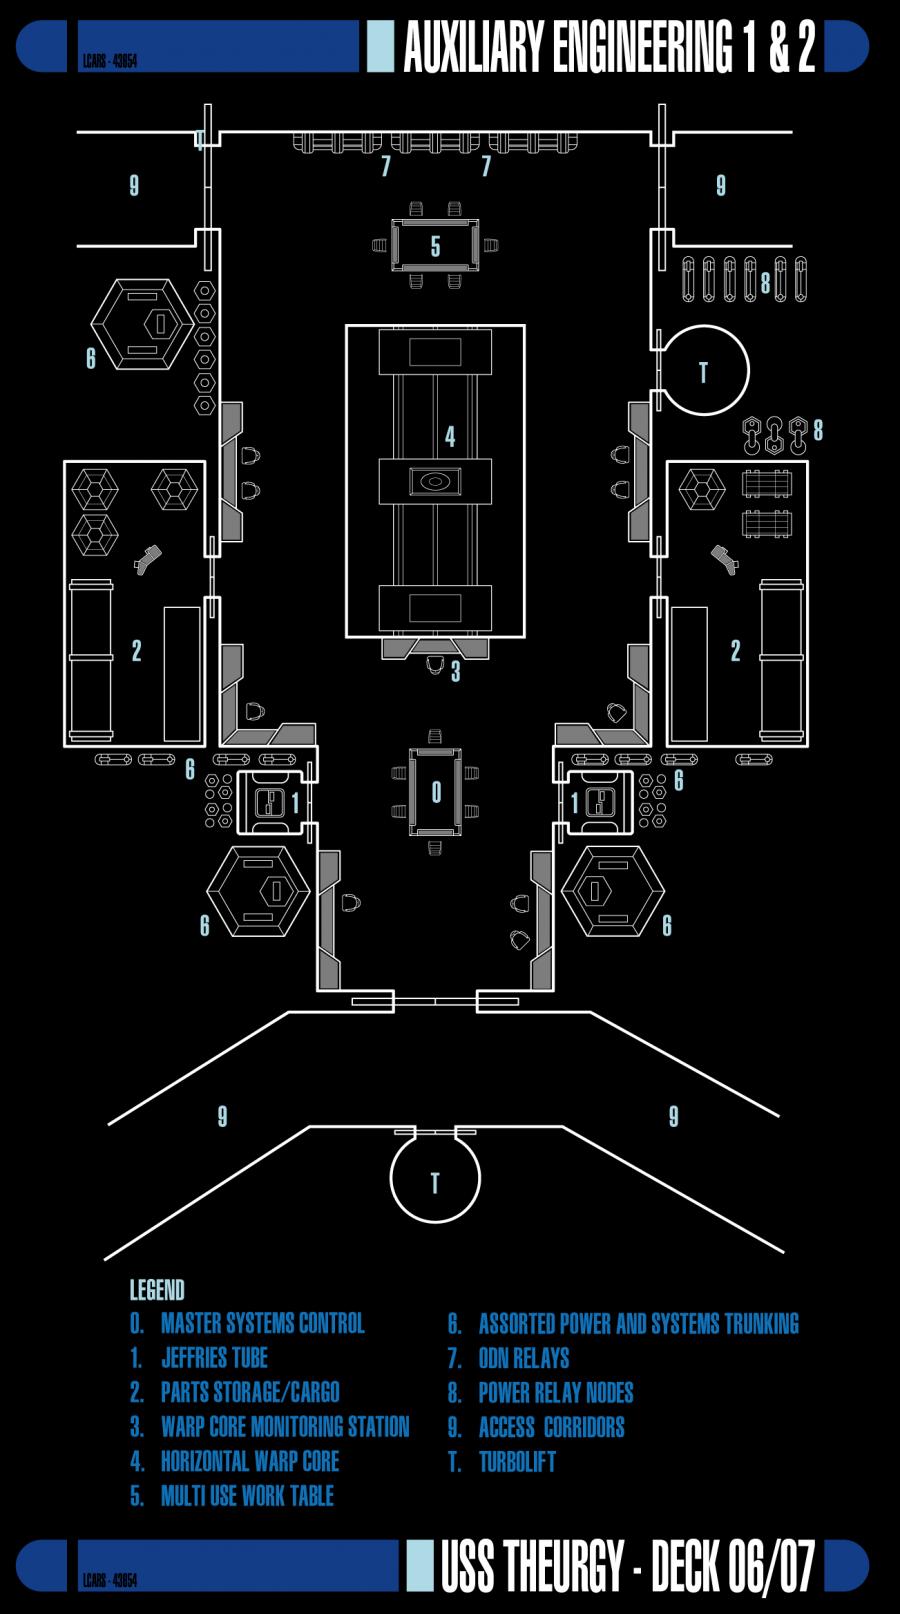 AUX-ENG-01-02.png